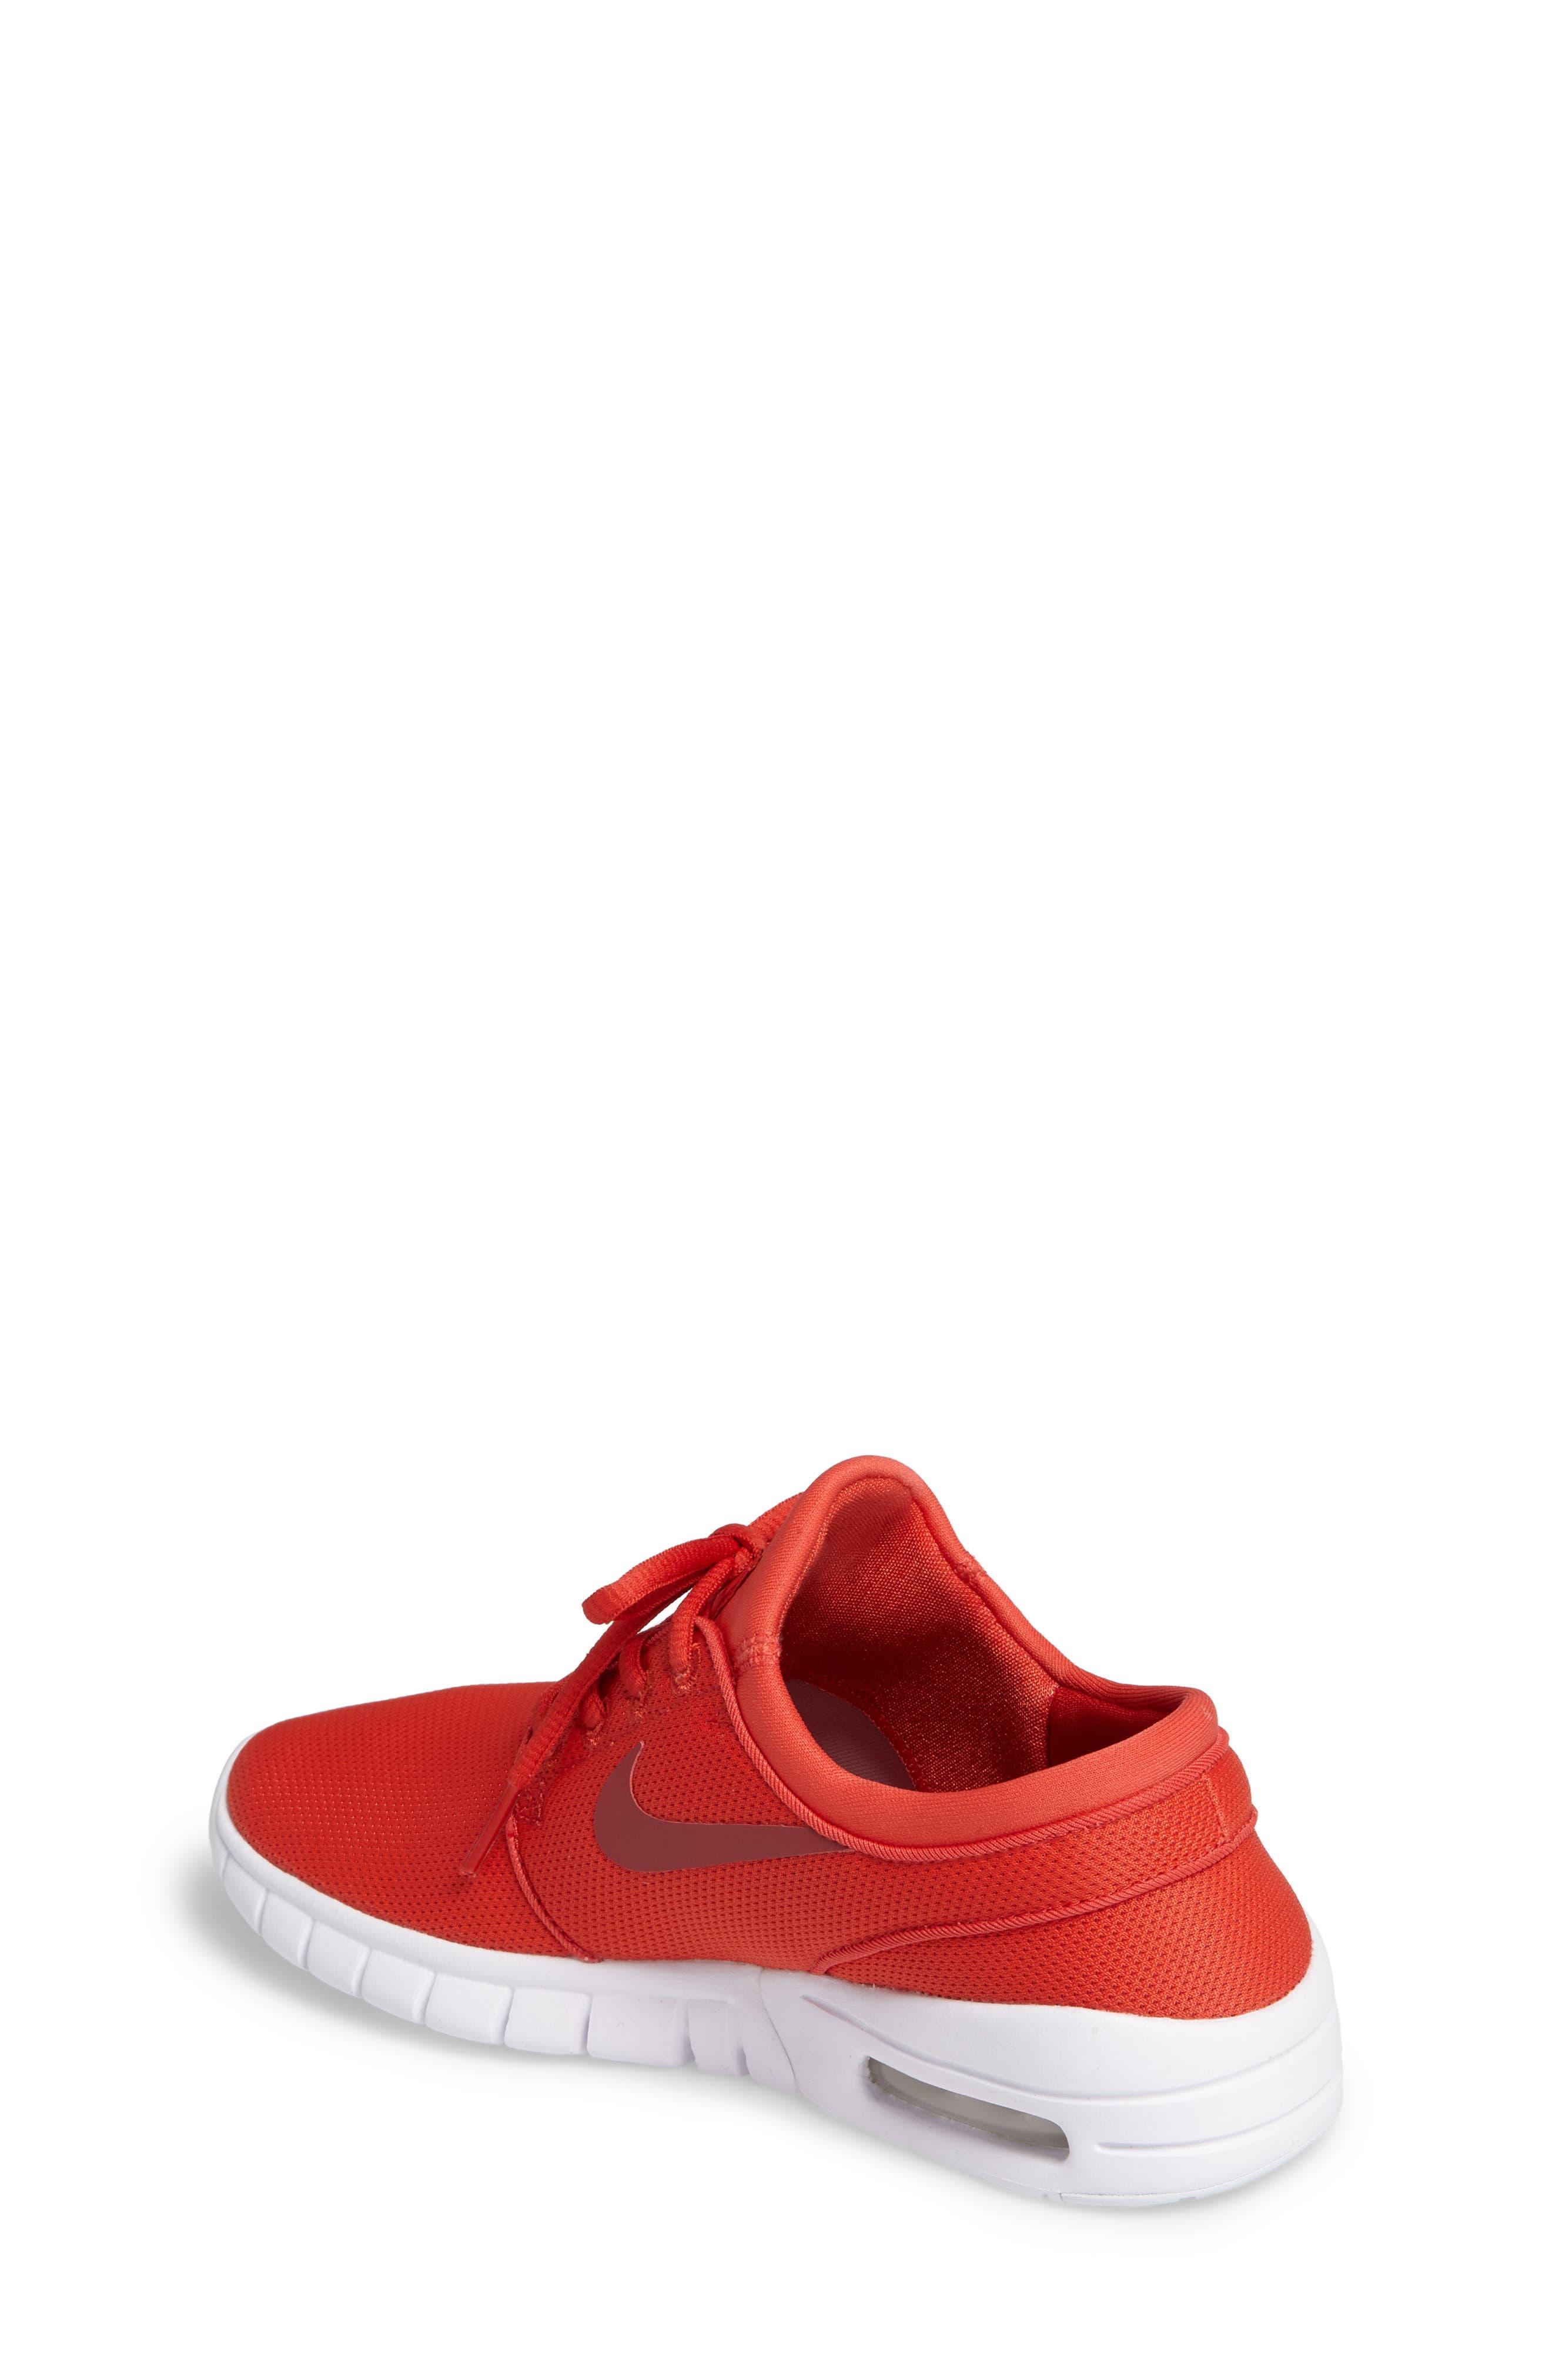 Stefan Janoski Max SB Skate Sneaker,                             Alternate thumbnail 17, color,